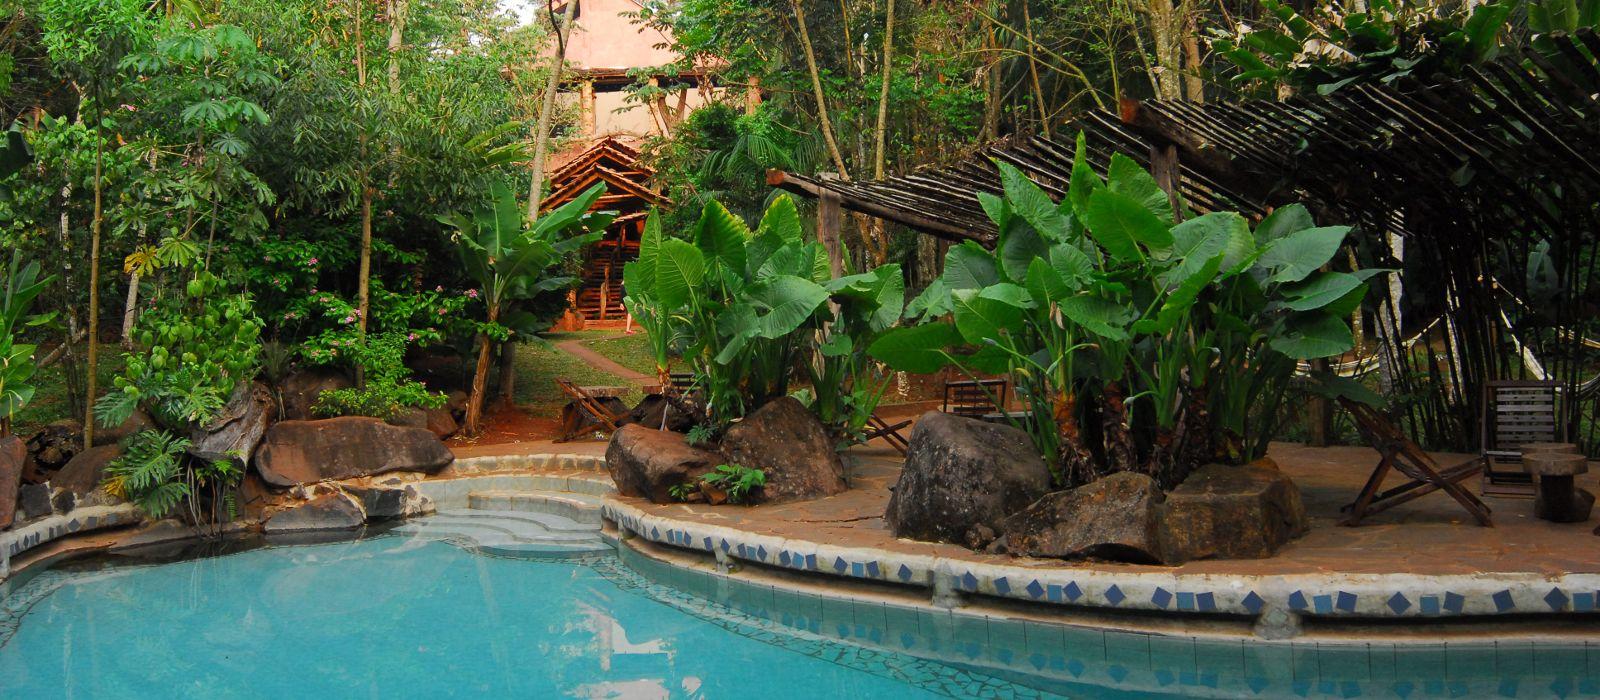 Hotel Yacutinga lodge Argentinien